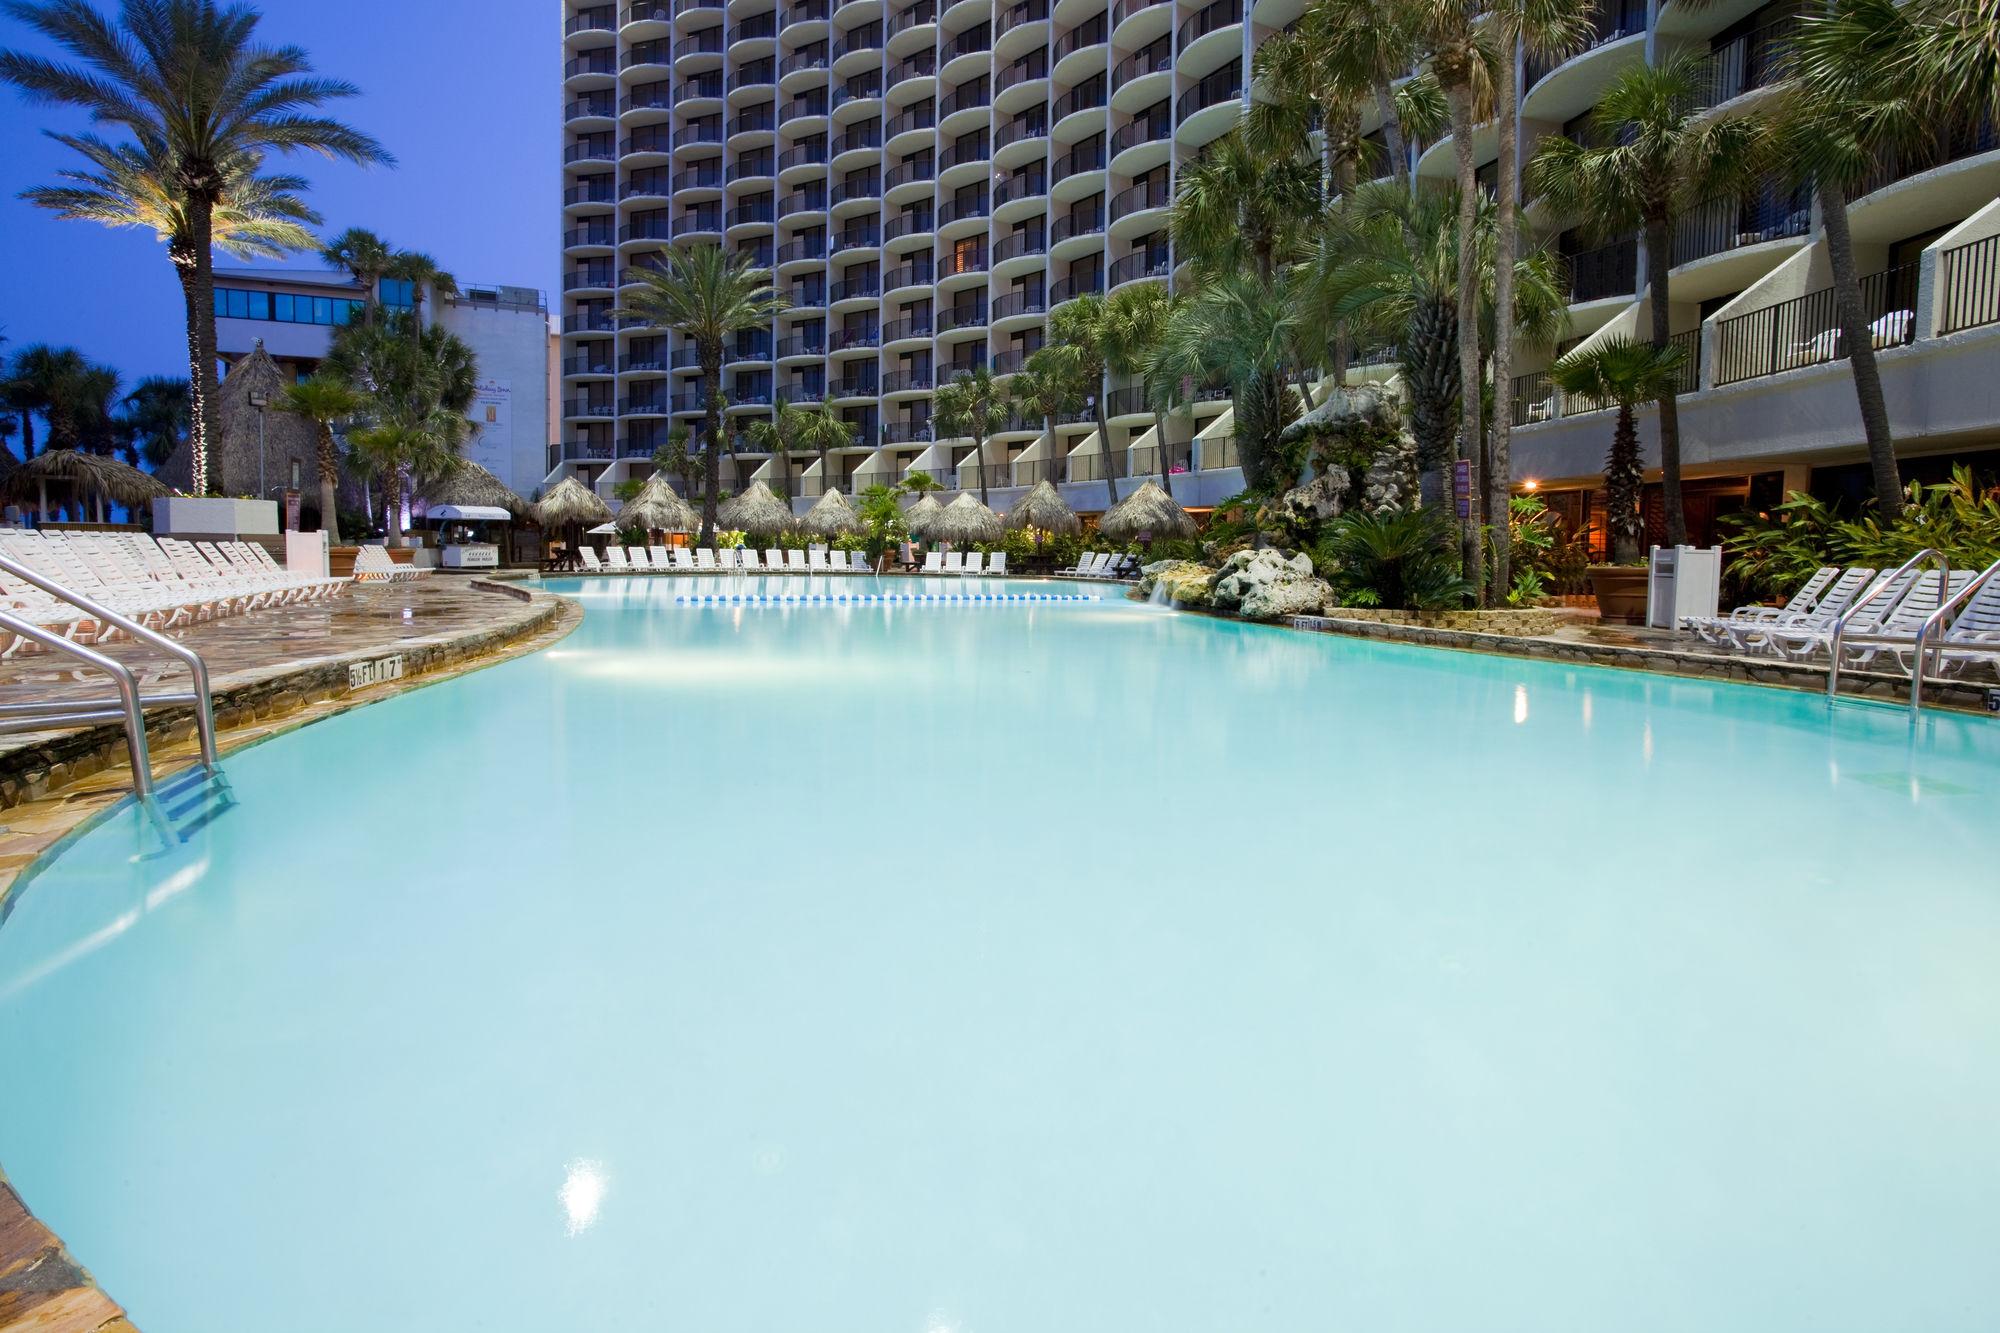 Holiday Inn Resort Panama City Beach in Panama City, FL